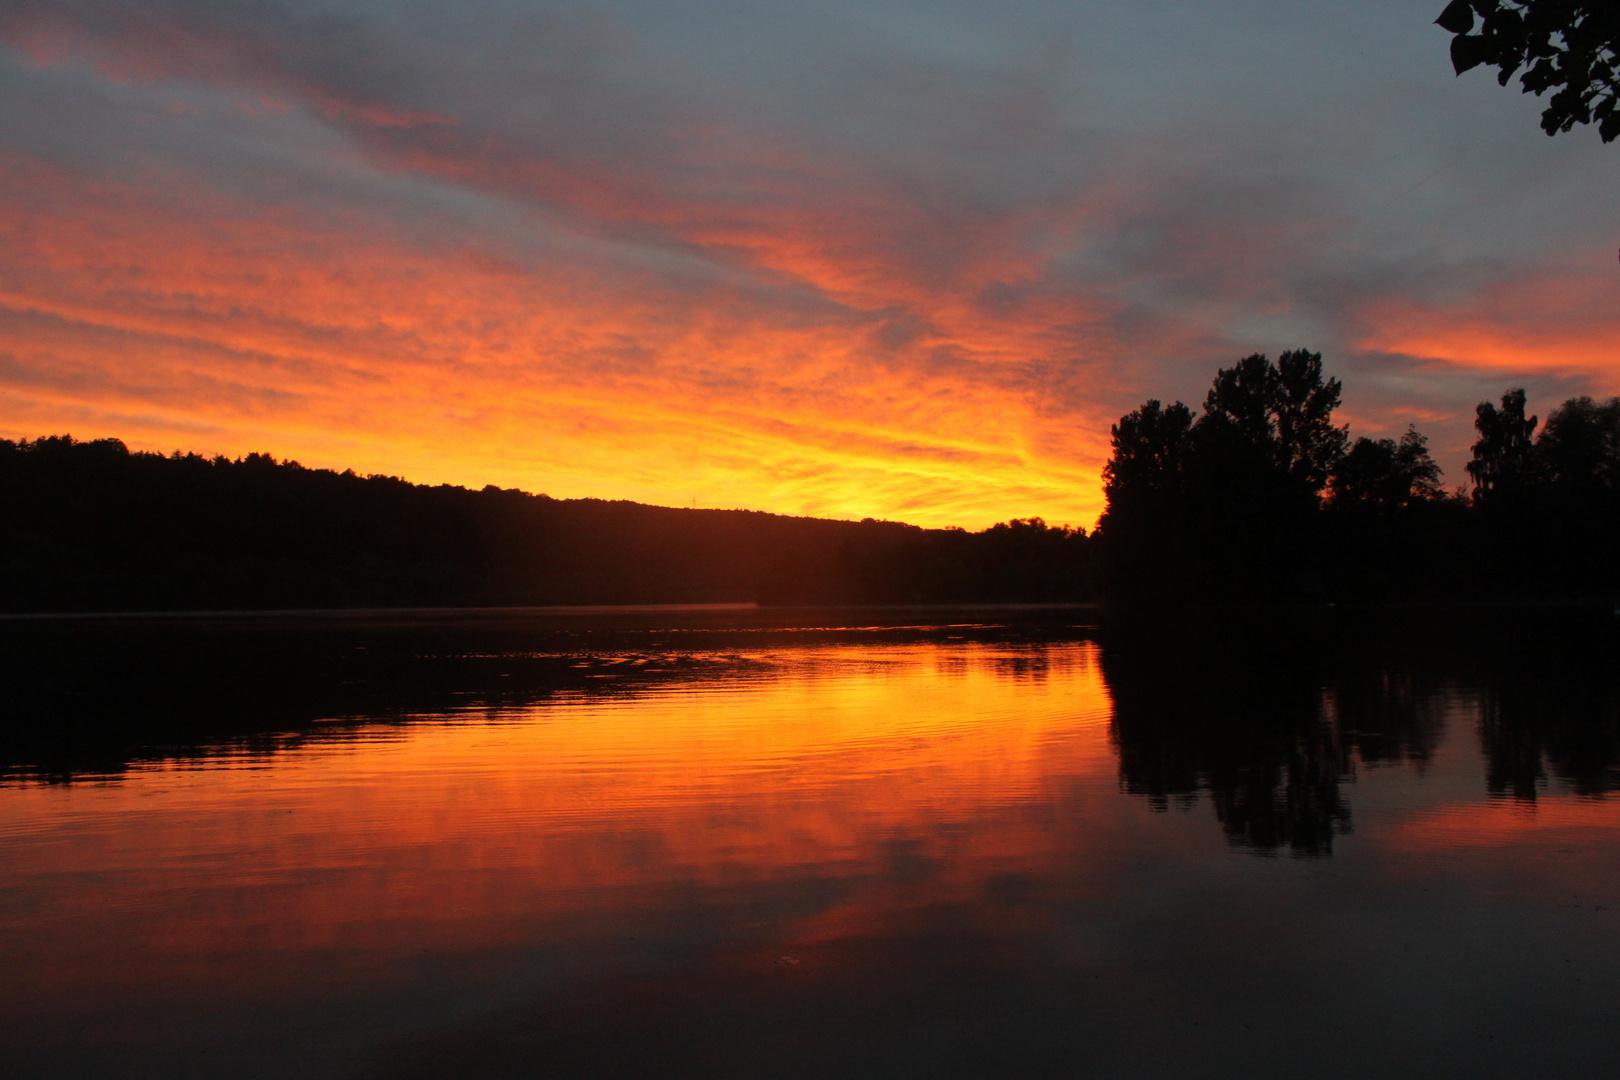 Sonnenuntergang#